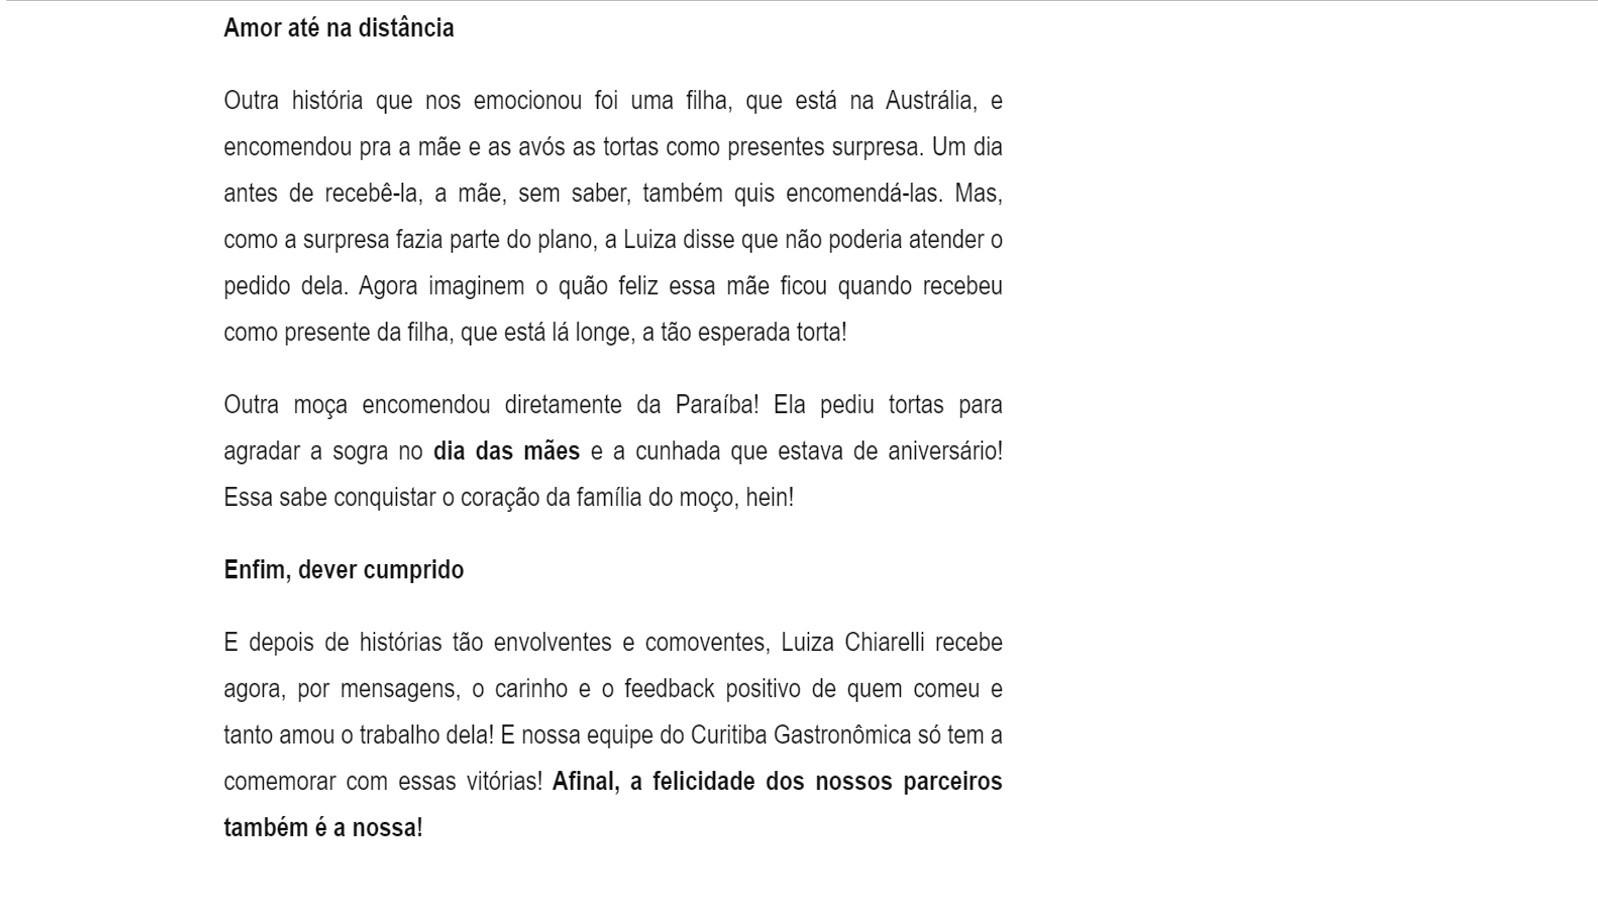 https://www.curitibagastronomica.com.br/dia-das-maes-luiza-chiarelli/